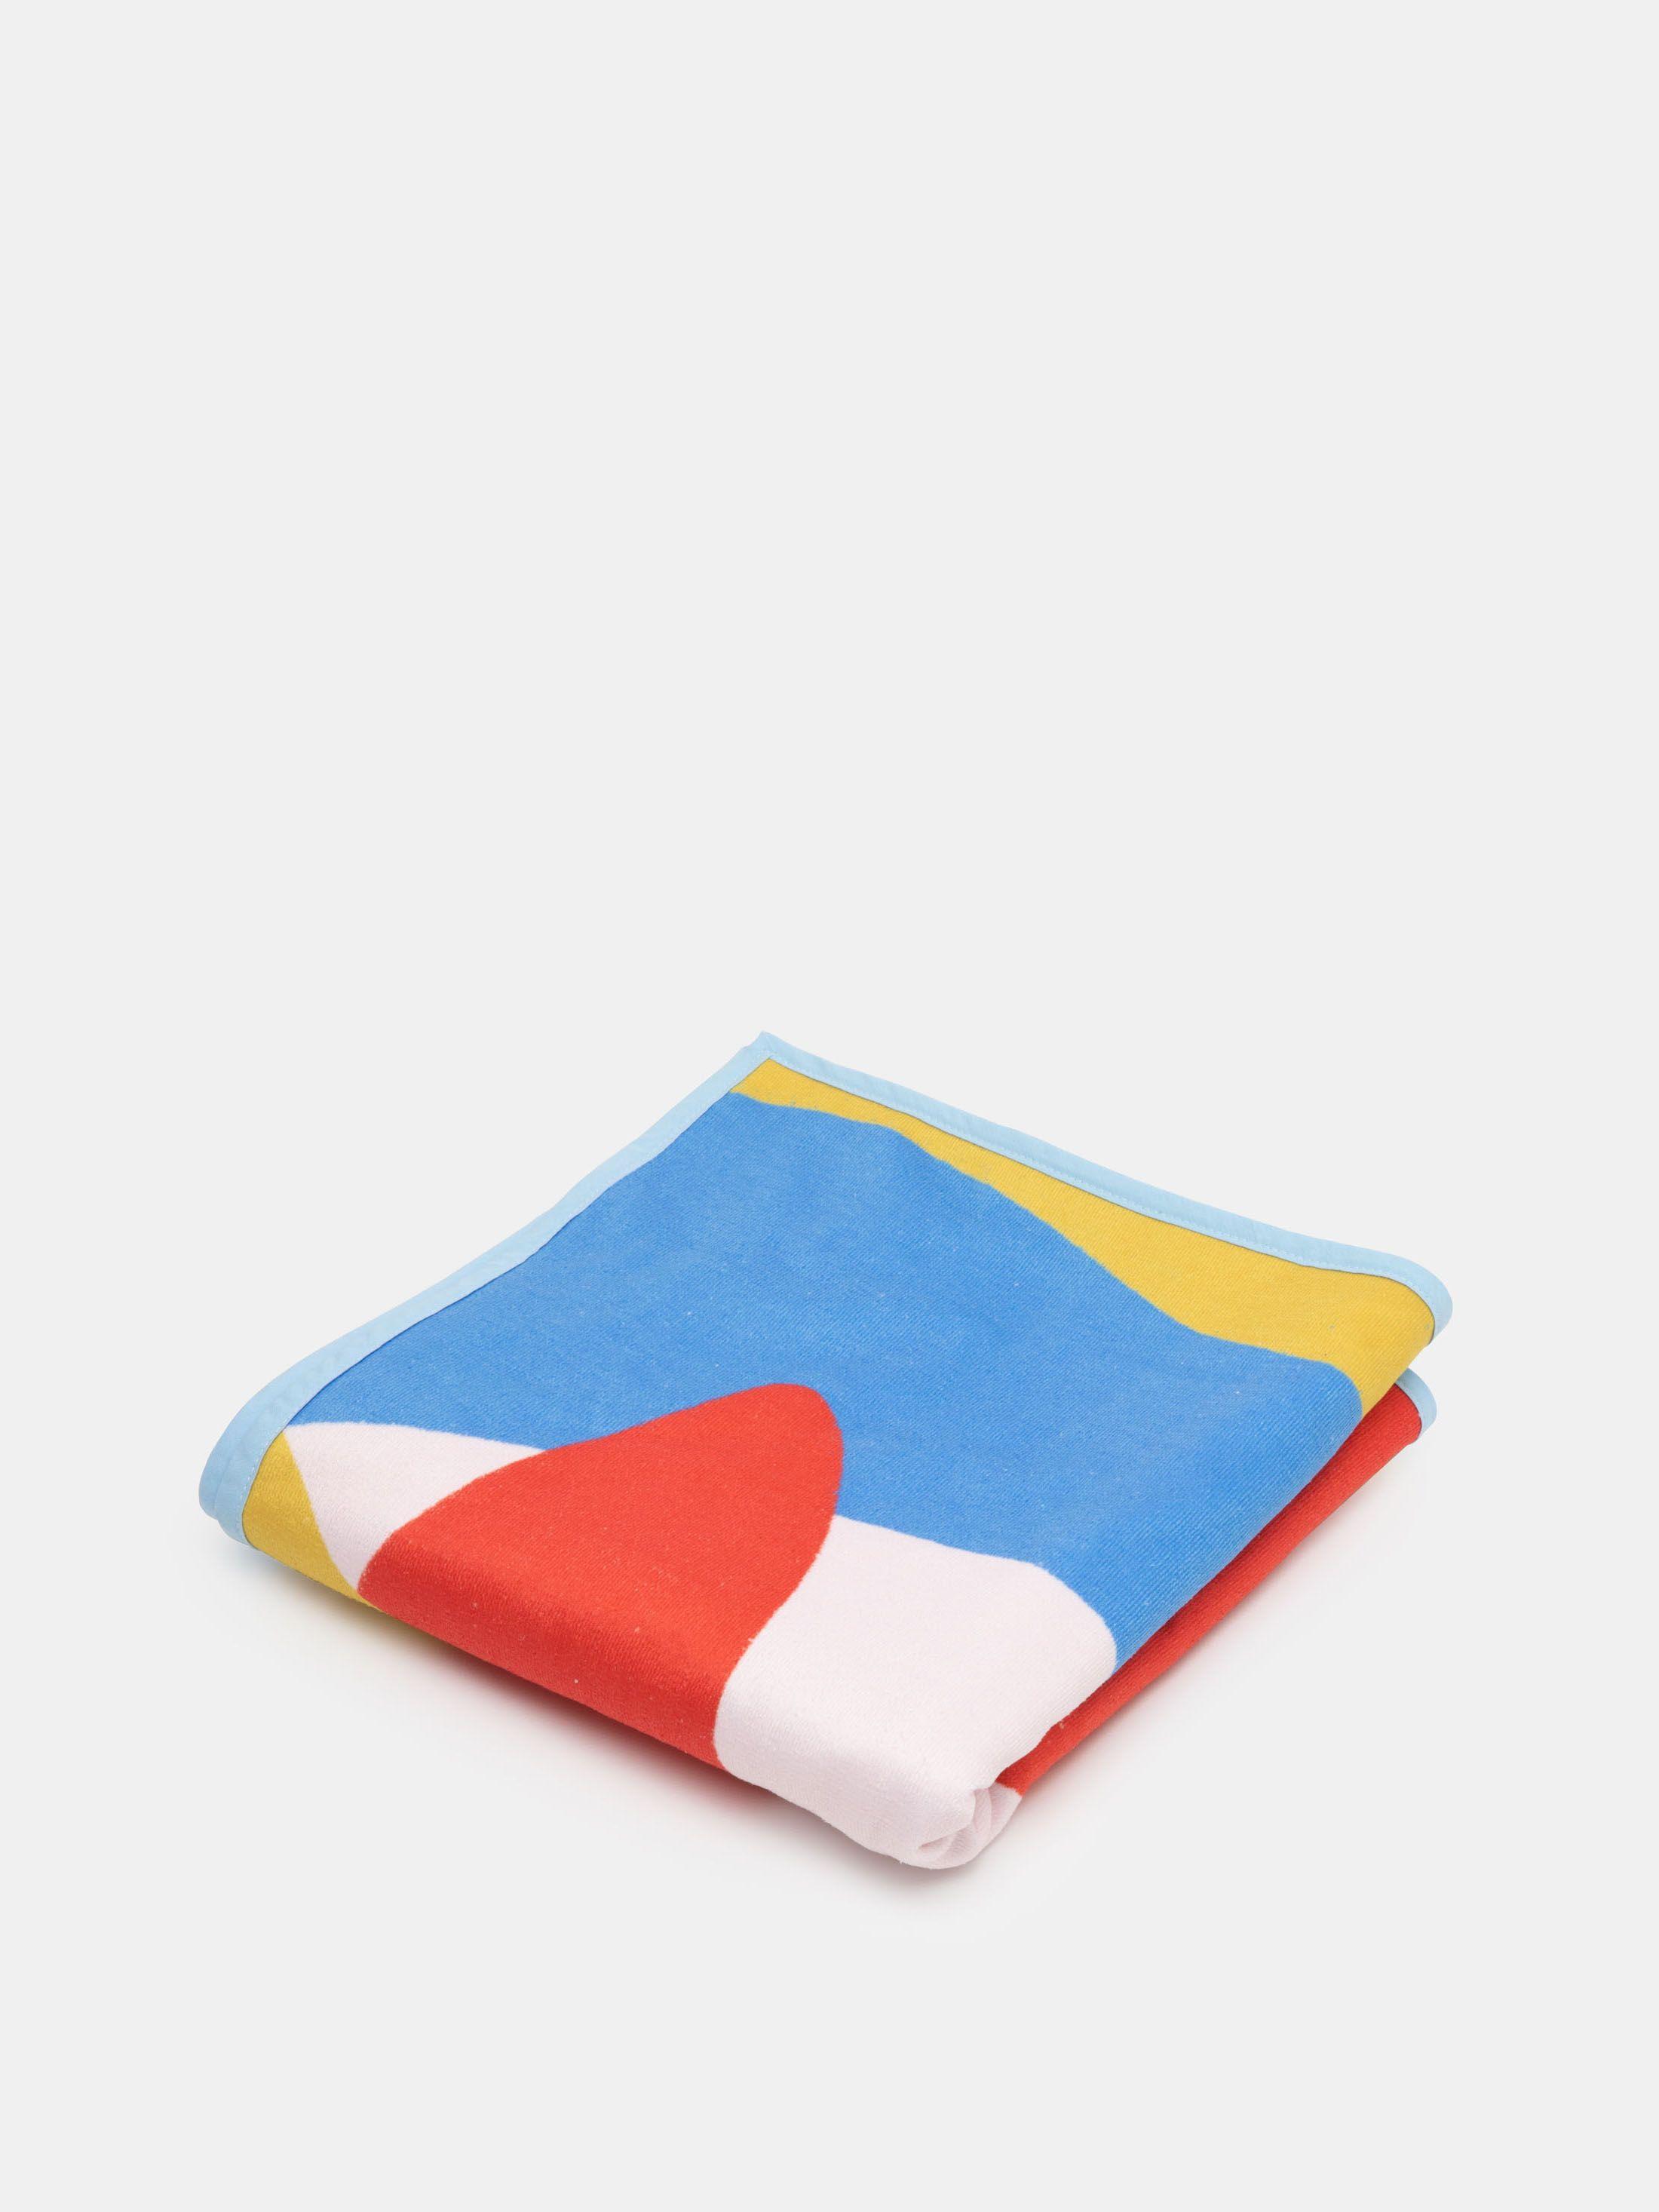 Customised Towels for Bathroom Use